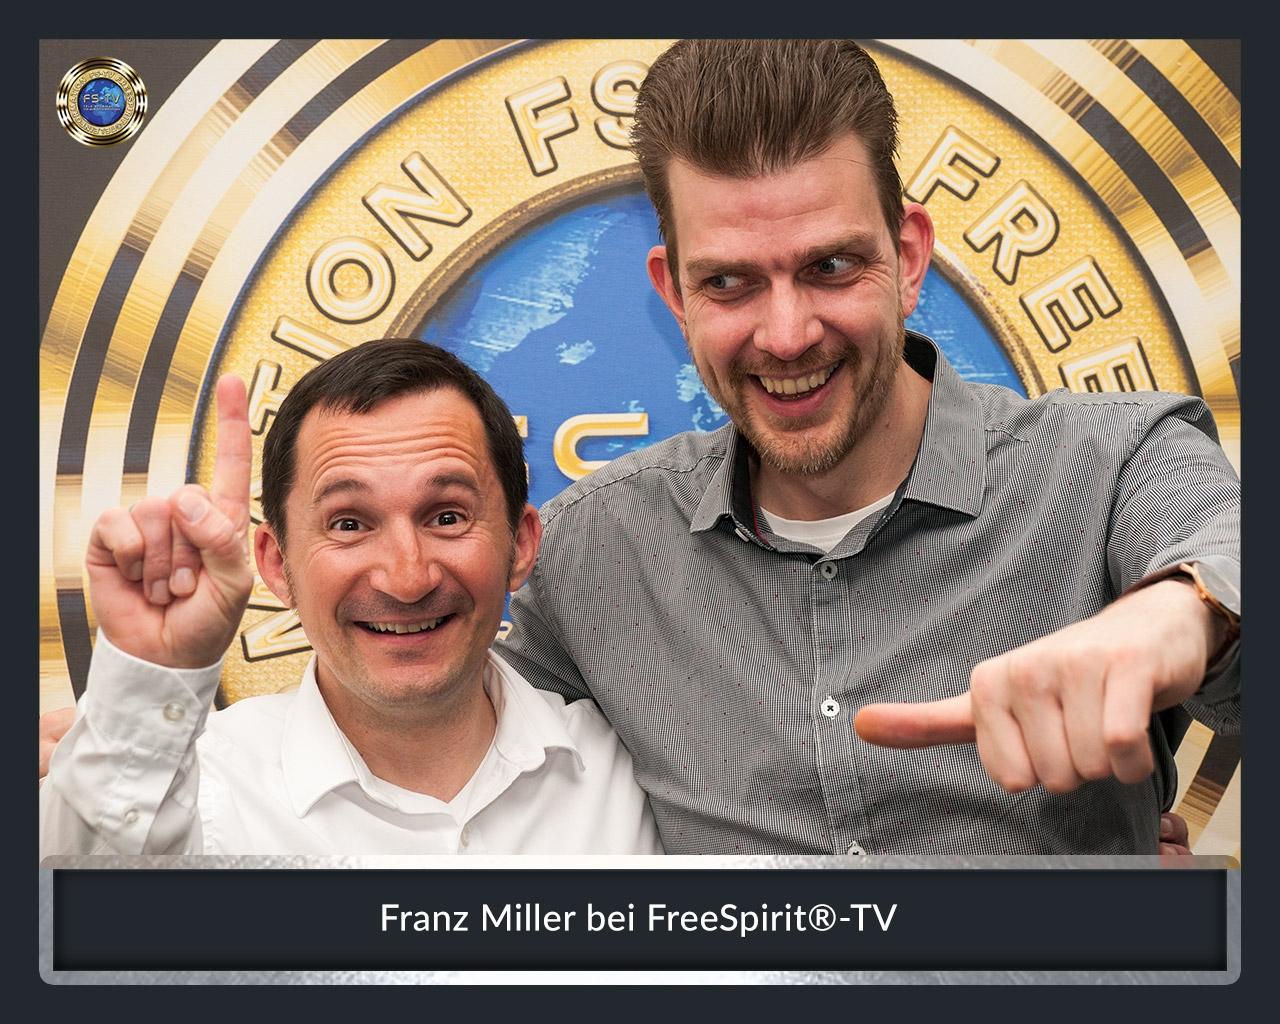 FS-TV-Bildergallerie-Franz-Miller-4